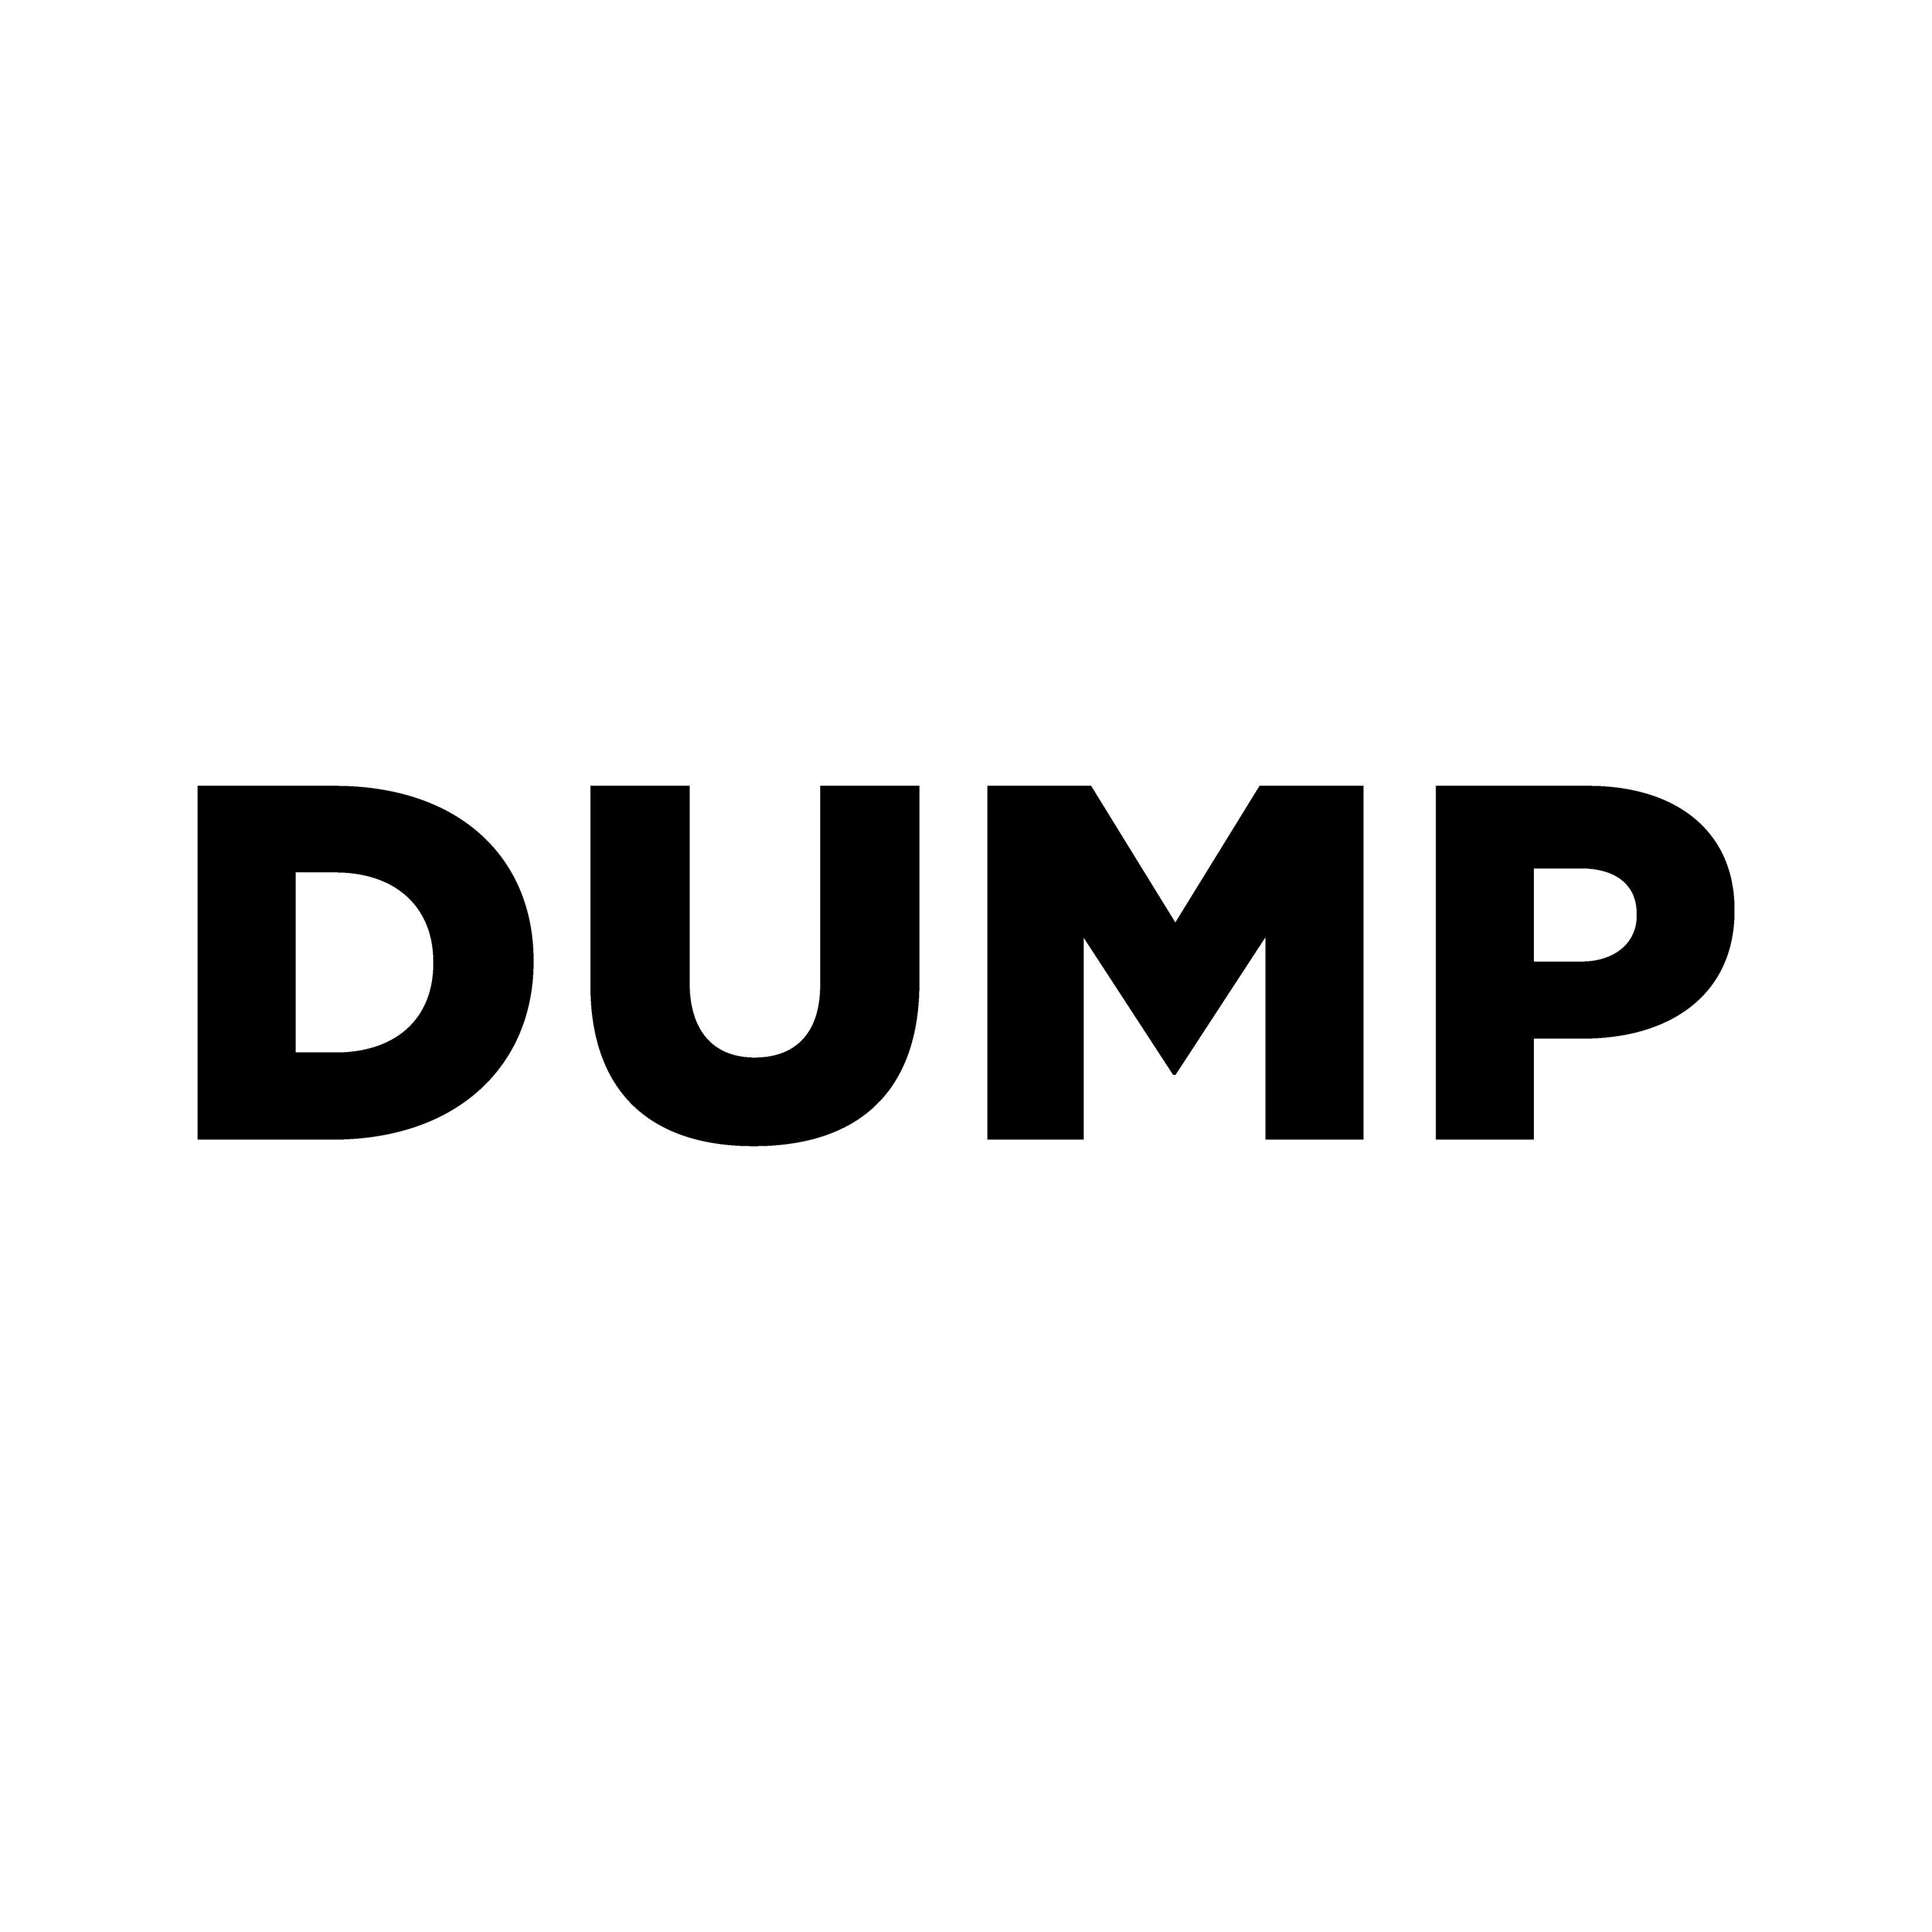 Good Dump